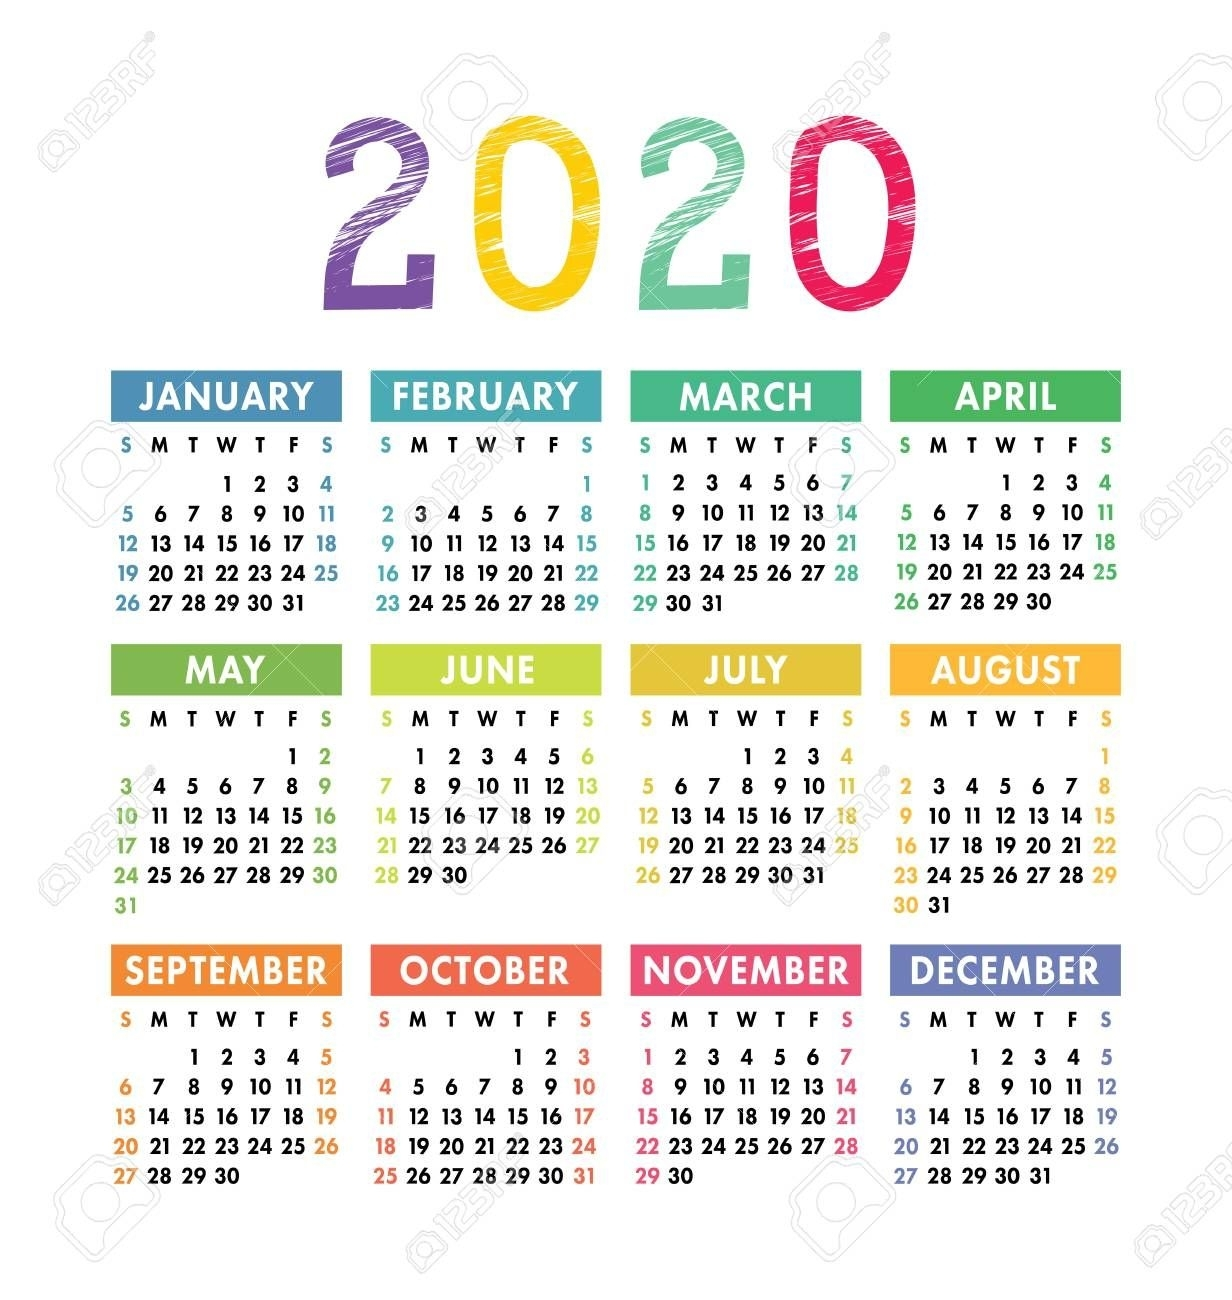 Calendar 2020 Year. Vector Pocket Or Wall Calender Template for Print Pocket Size Calendar For 2020